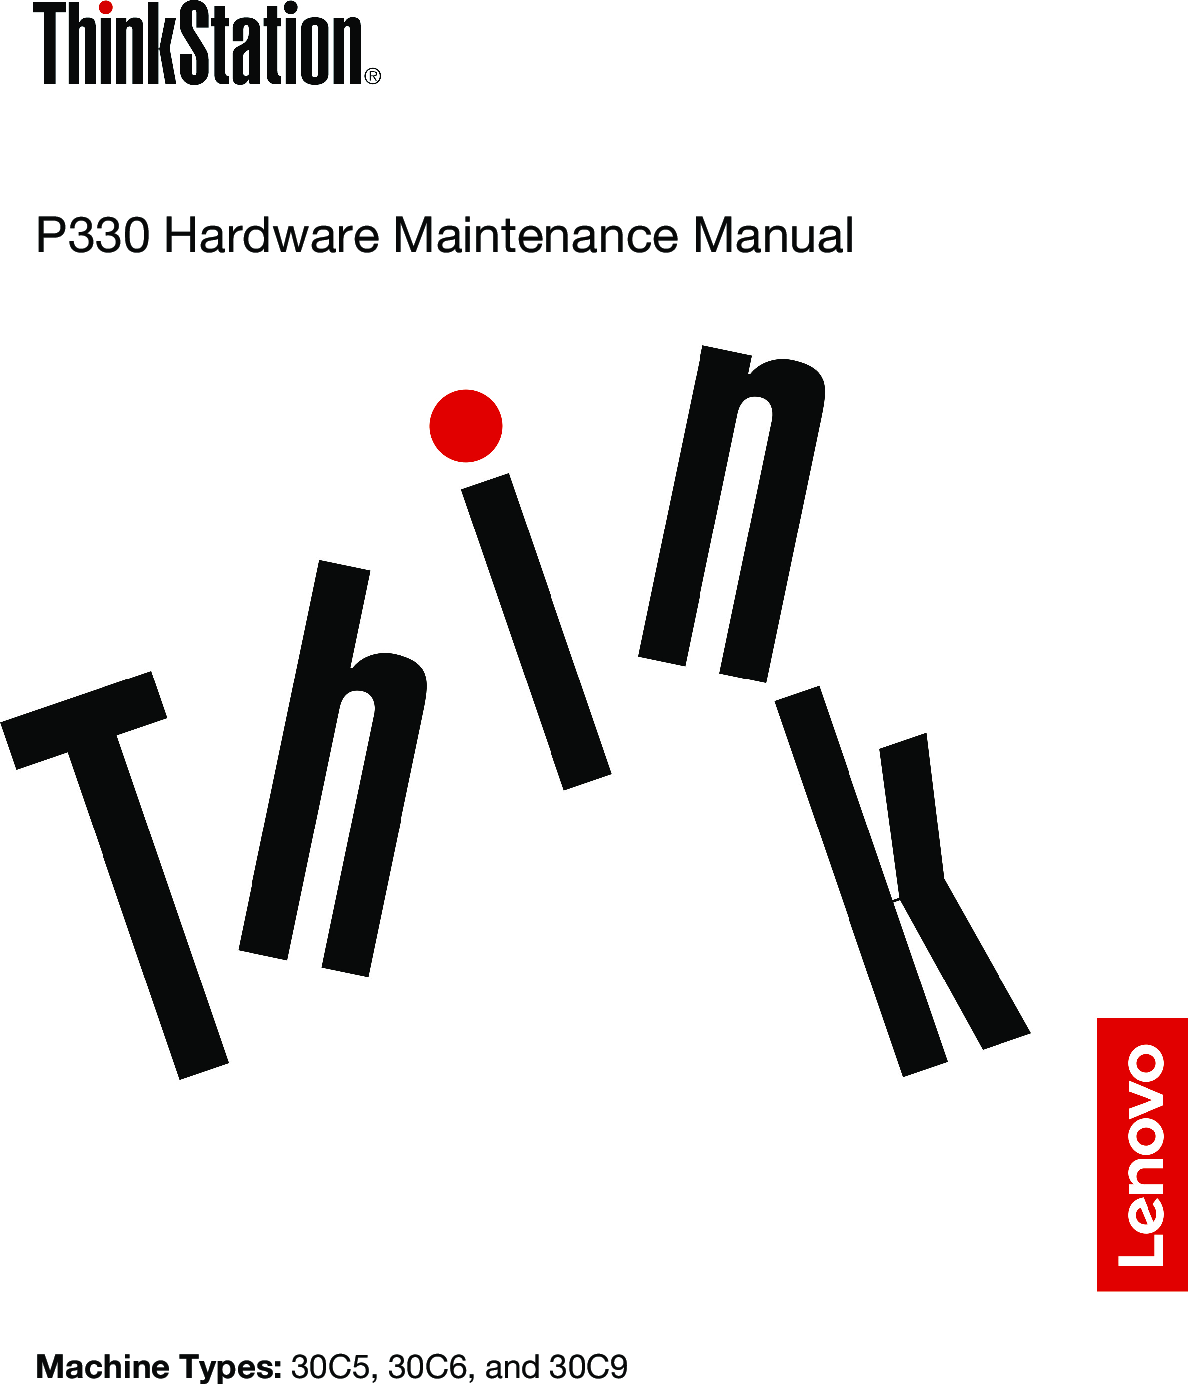 Lenovo P330 Hardware Maintenance Manual (English) (Tower